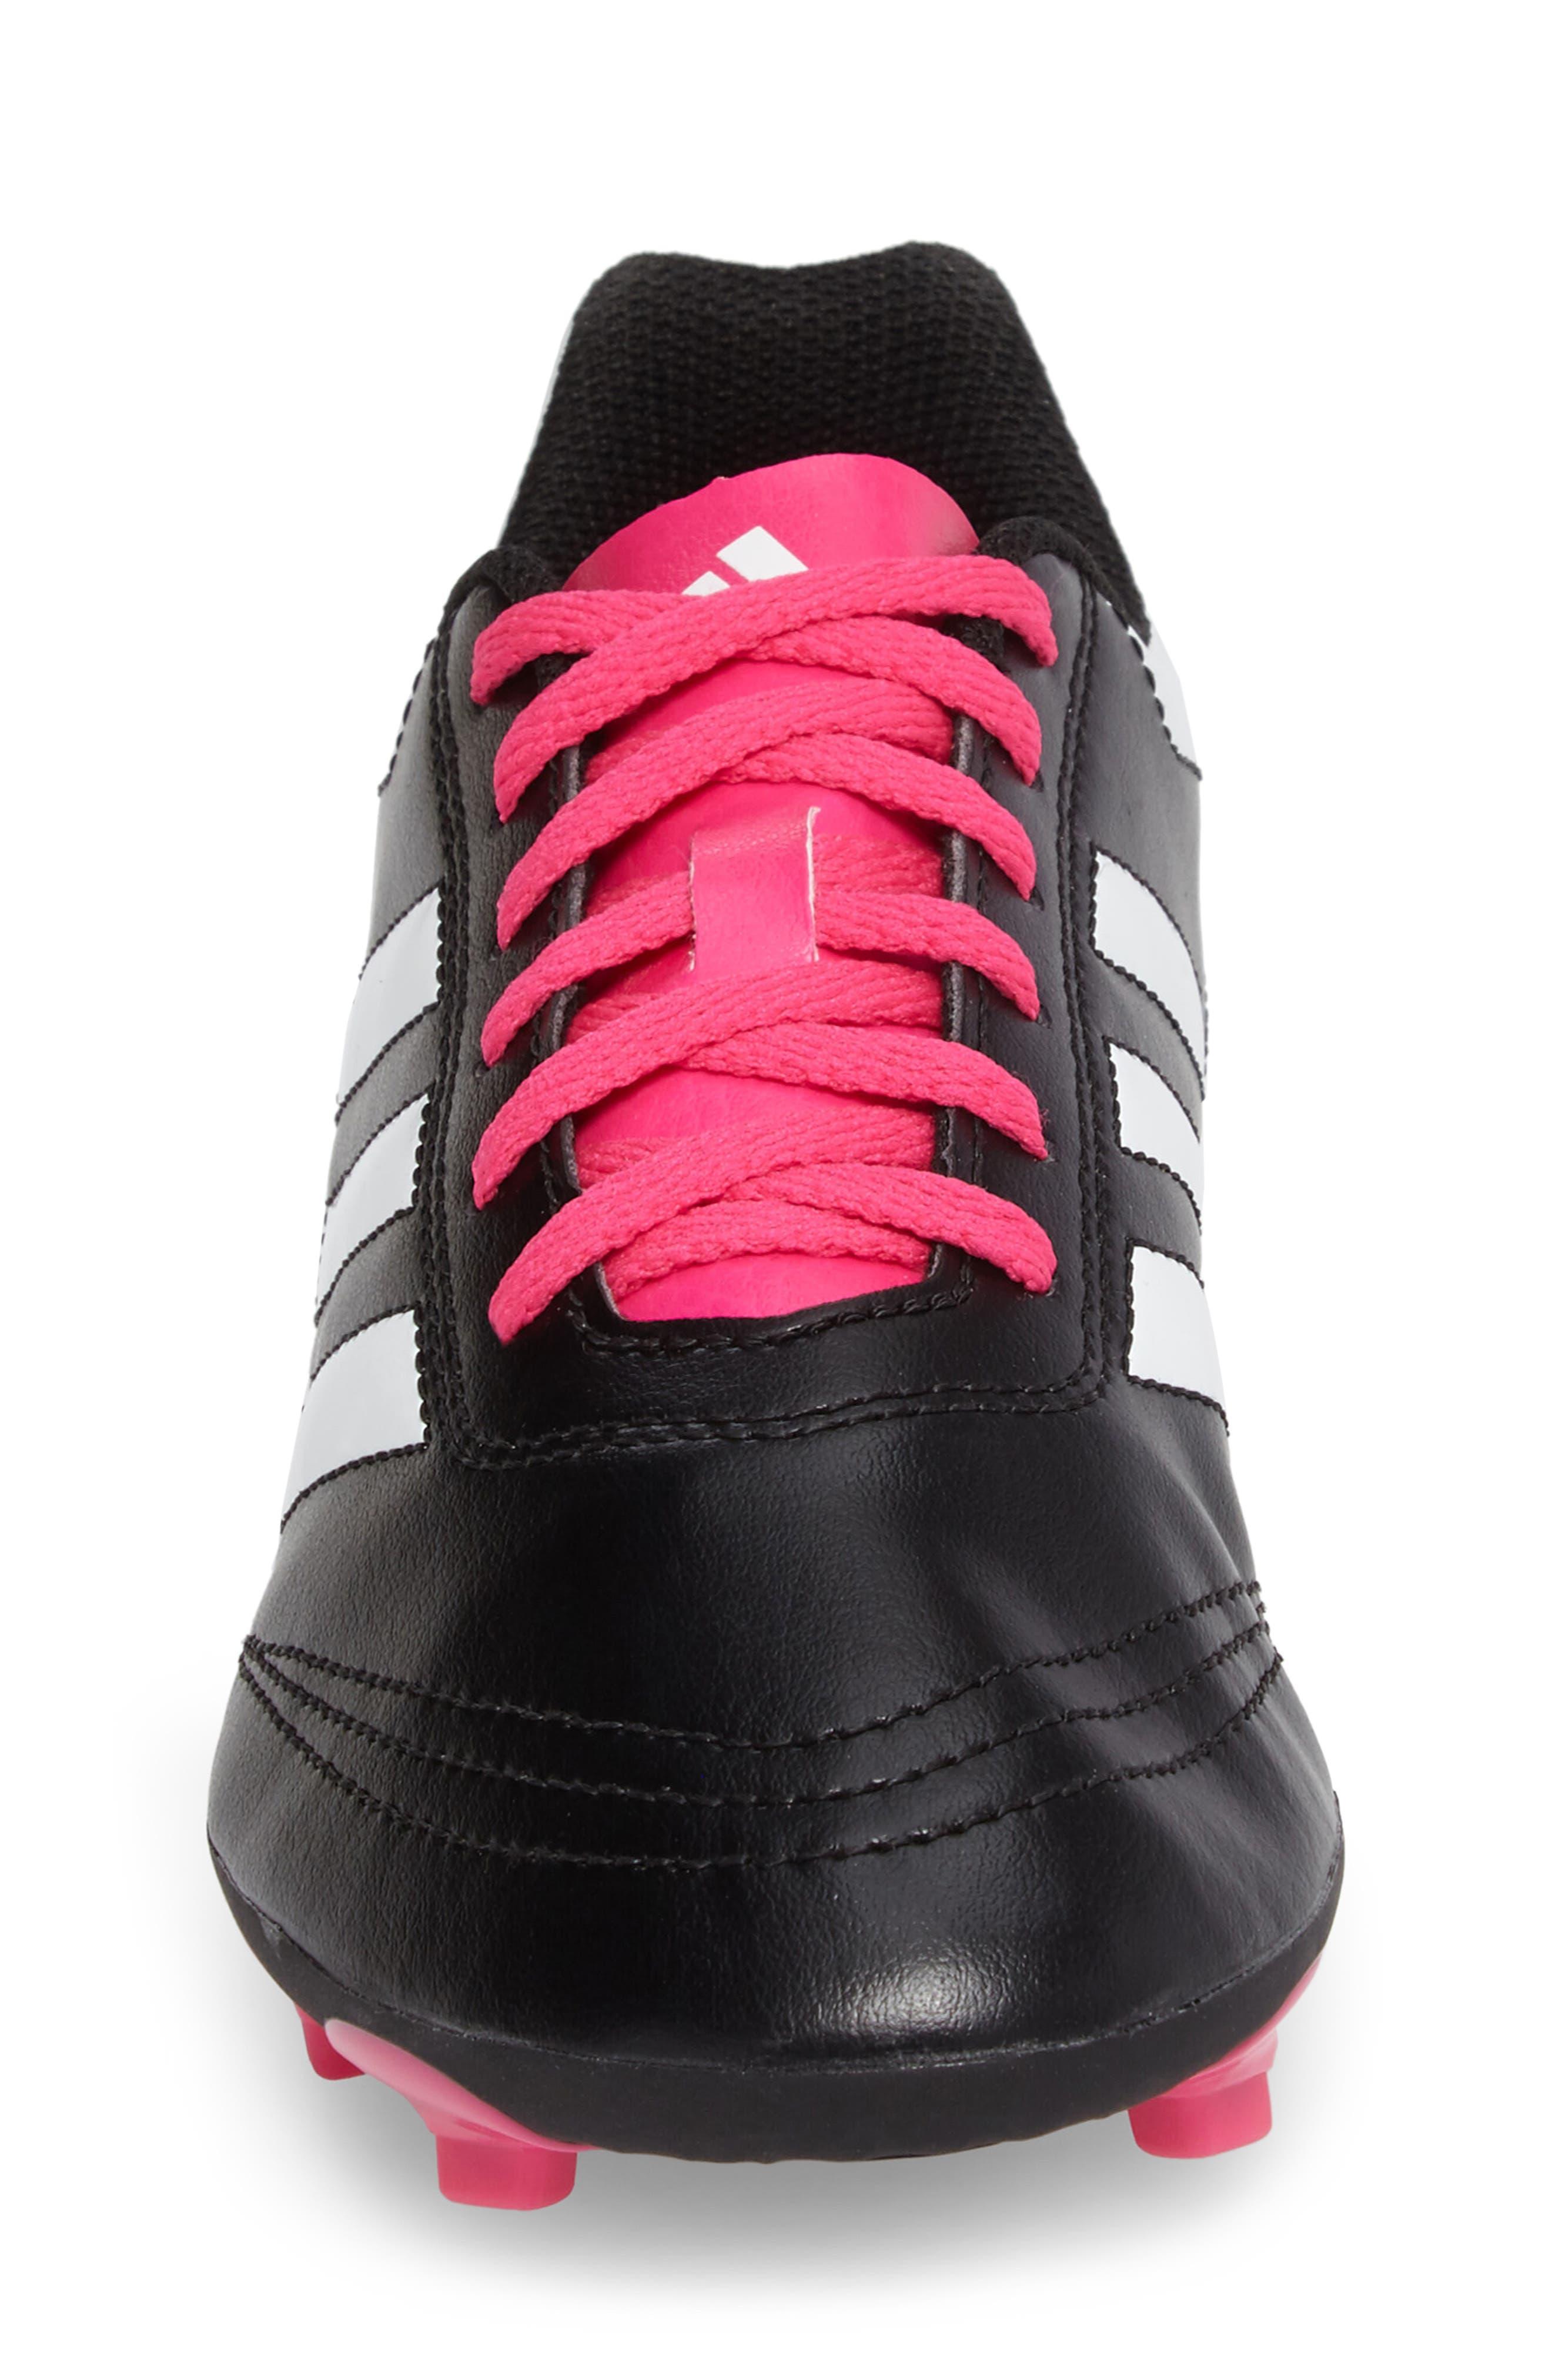 Goletto VI Soccer Shoe,                             Alternate thumbnail 4, color,                             CORE BLACK/ WHITE/ SHOCK PINK